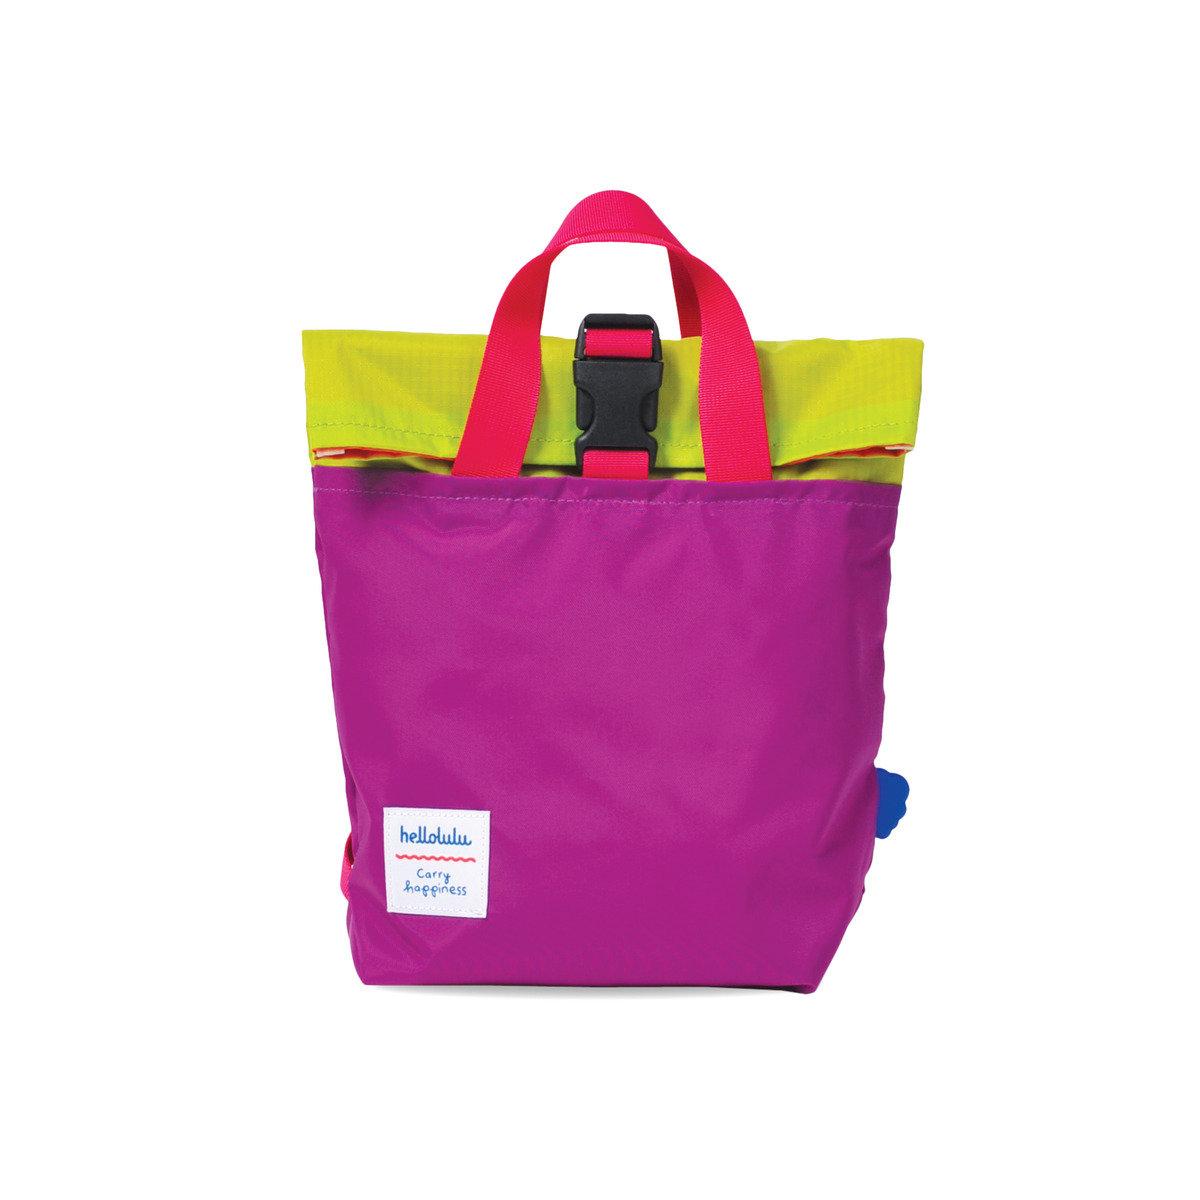 JAZPER 捲袖式多功能小童背包(適合2-5歲)